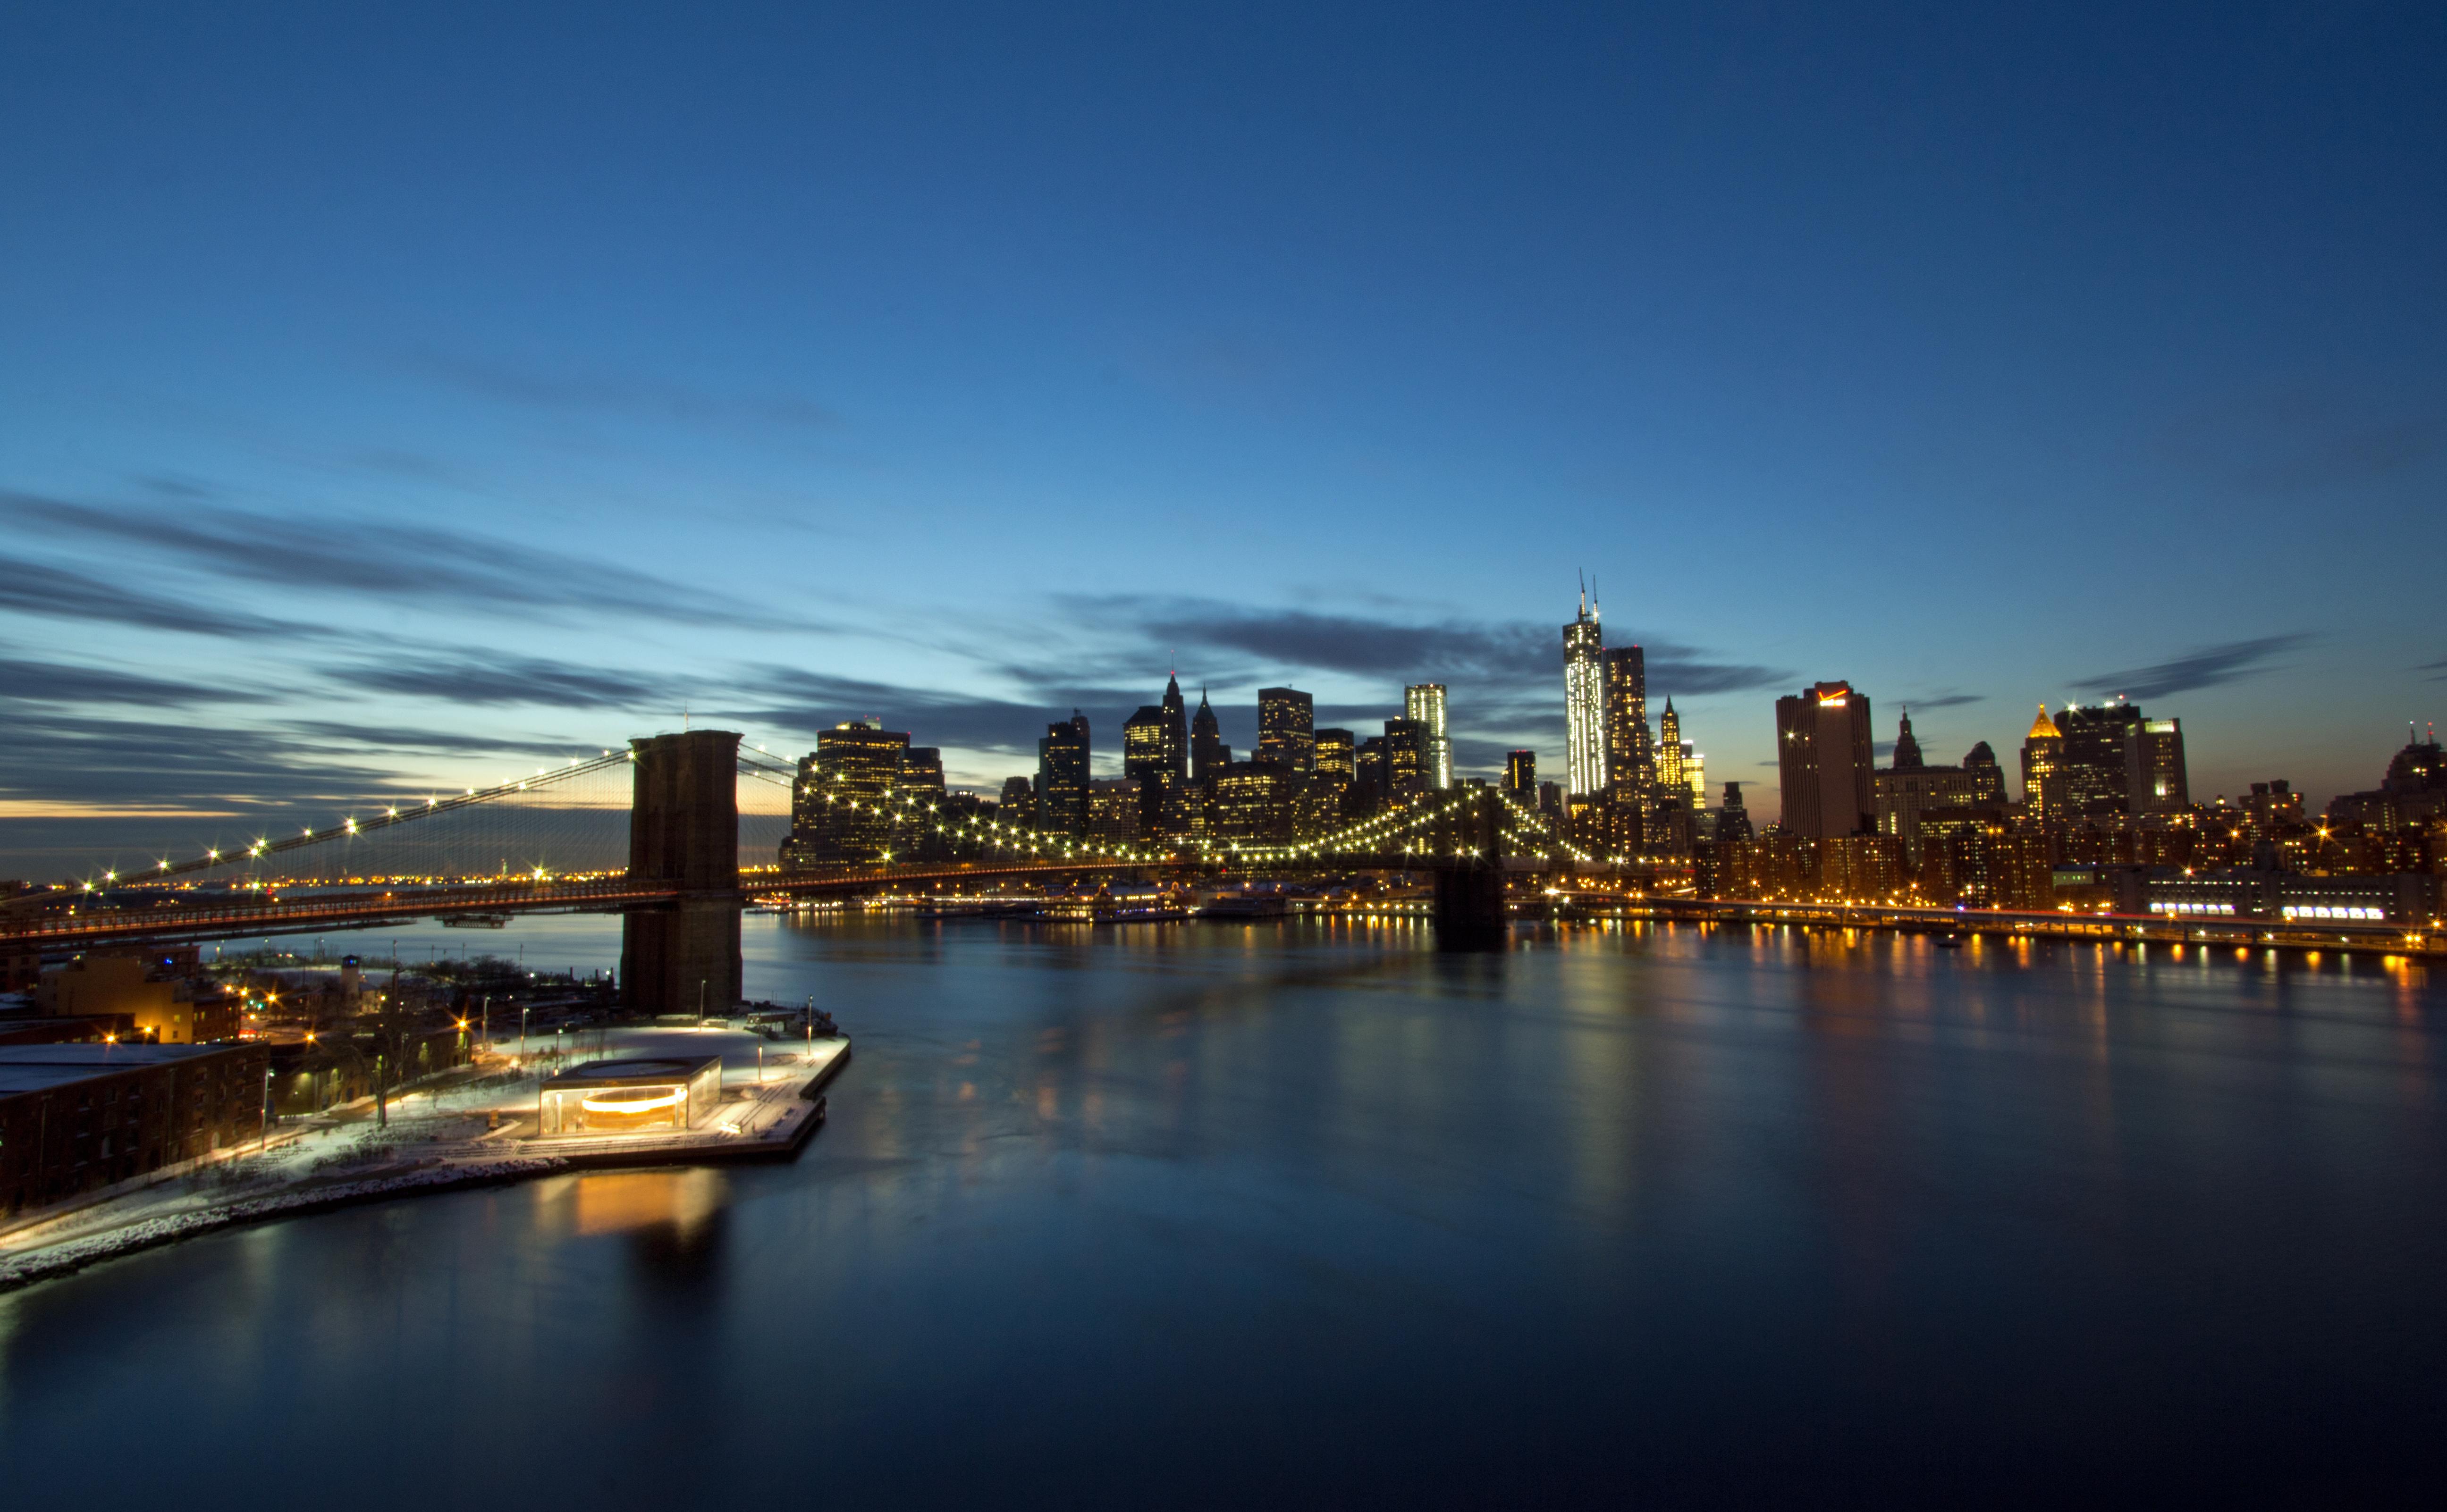 Brooklyn Bridge and Downtown Skyline at Twilight | johnnydlive